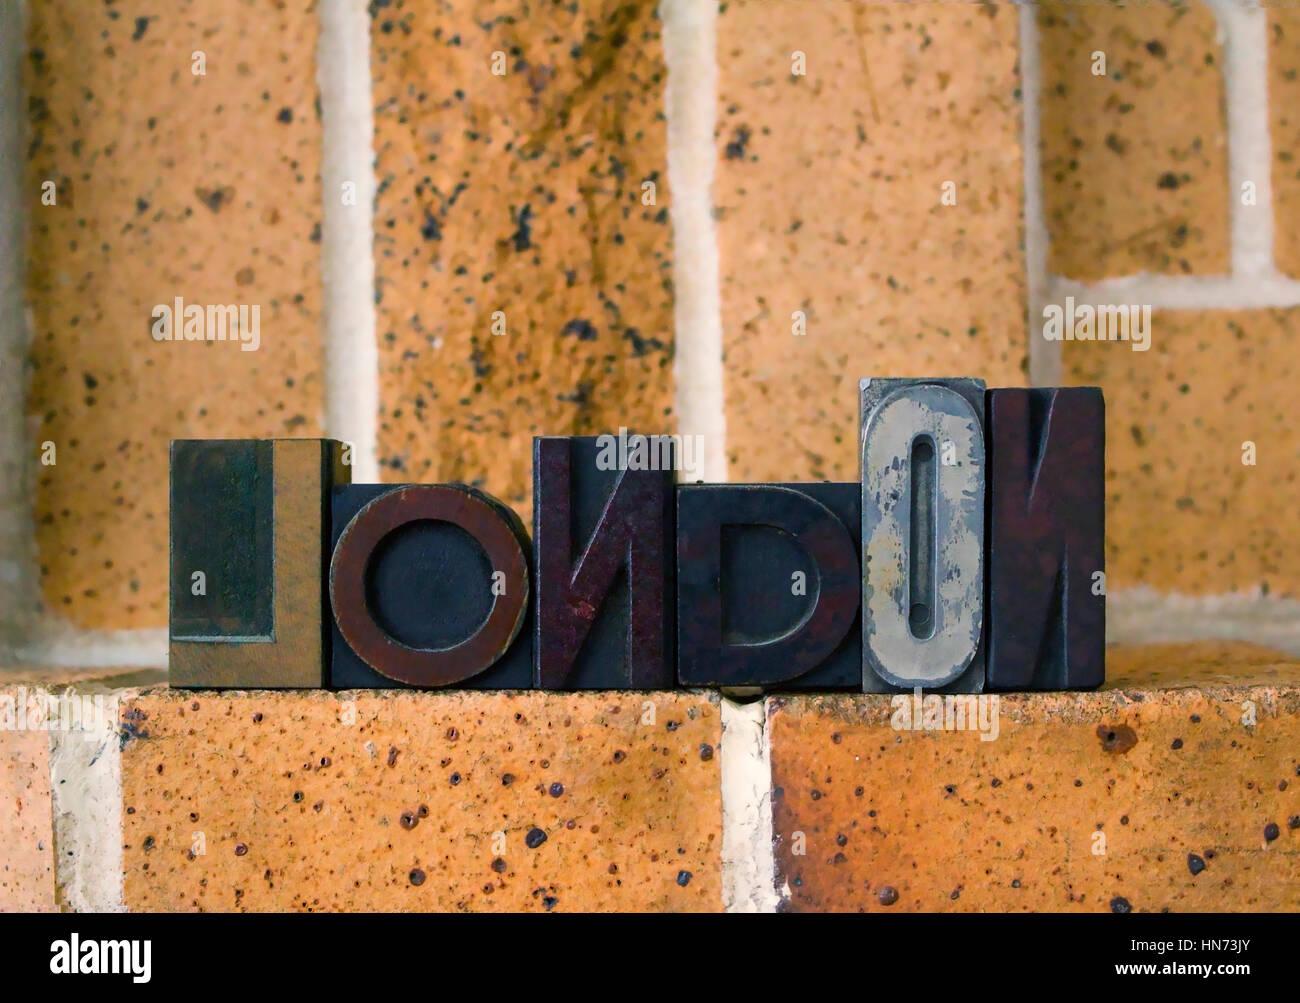 London Typesetting - Stock Image